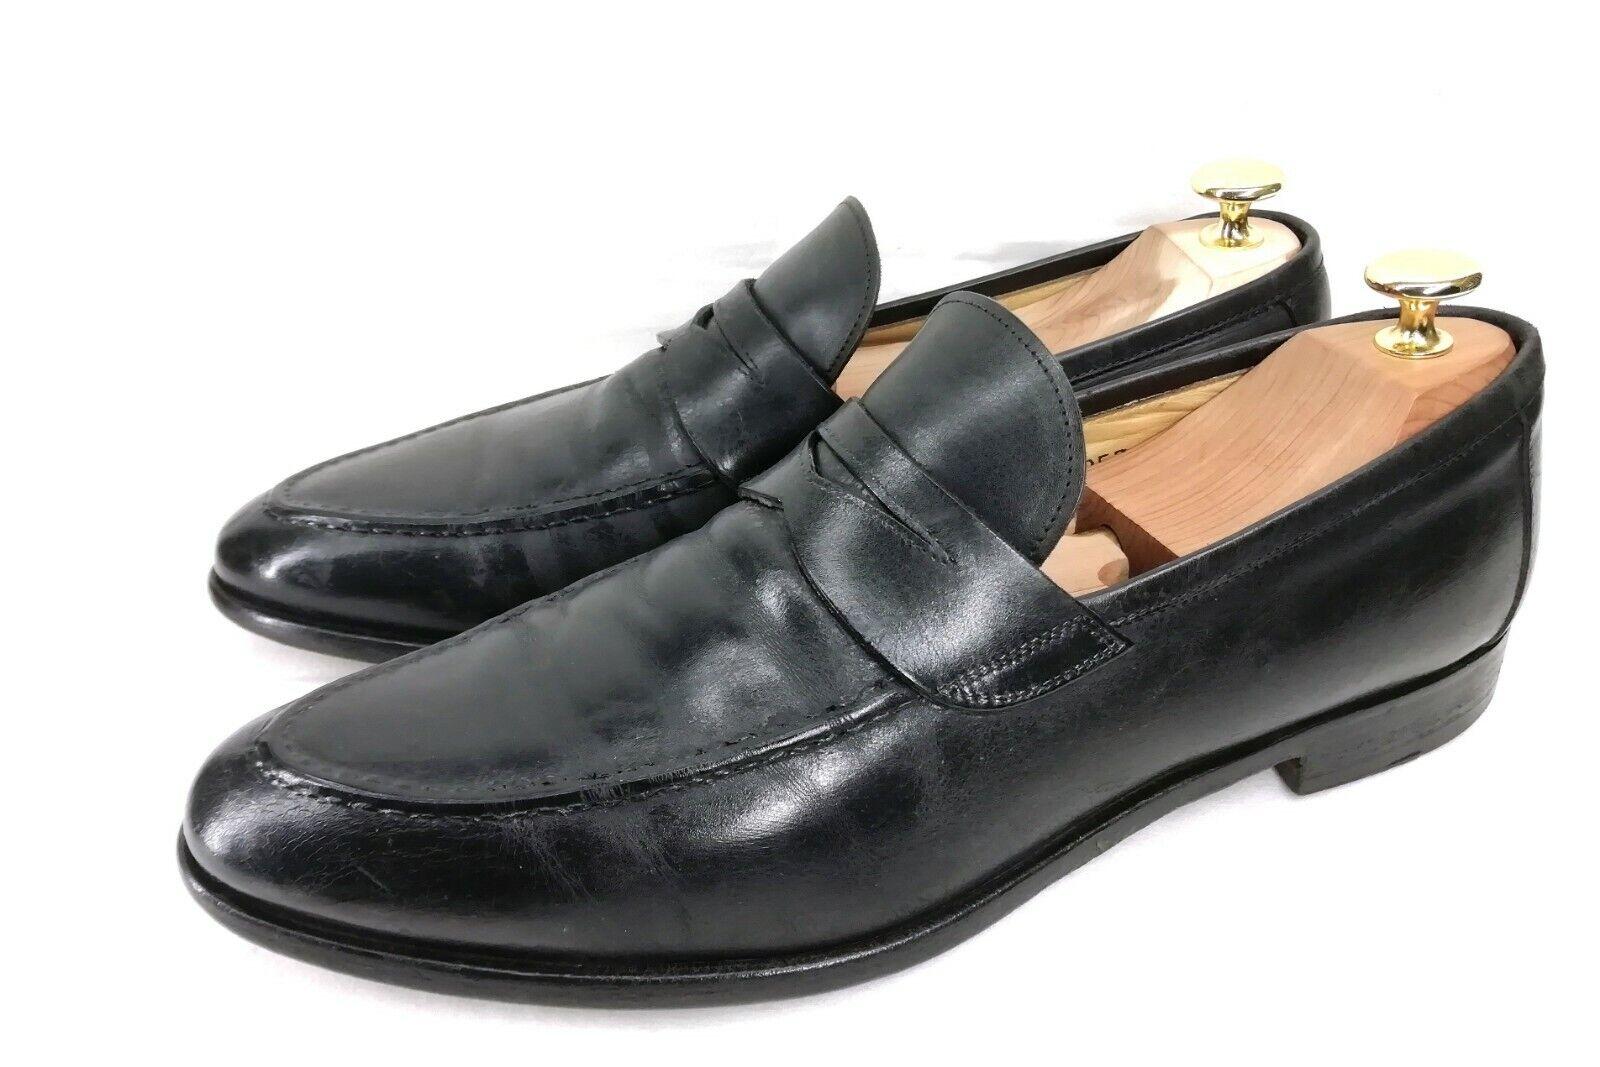 POLLINI Elegant Business Penny Loafer Mokassin Herrenschuhe Schwarz Leder ca. 44    | Das hochwertigste Material